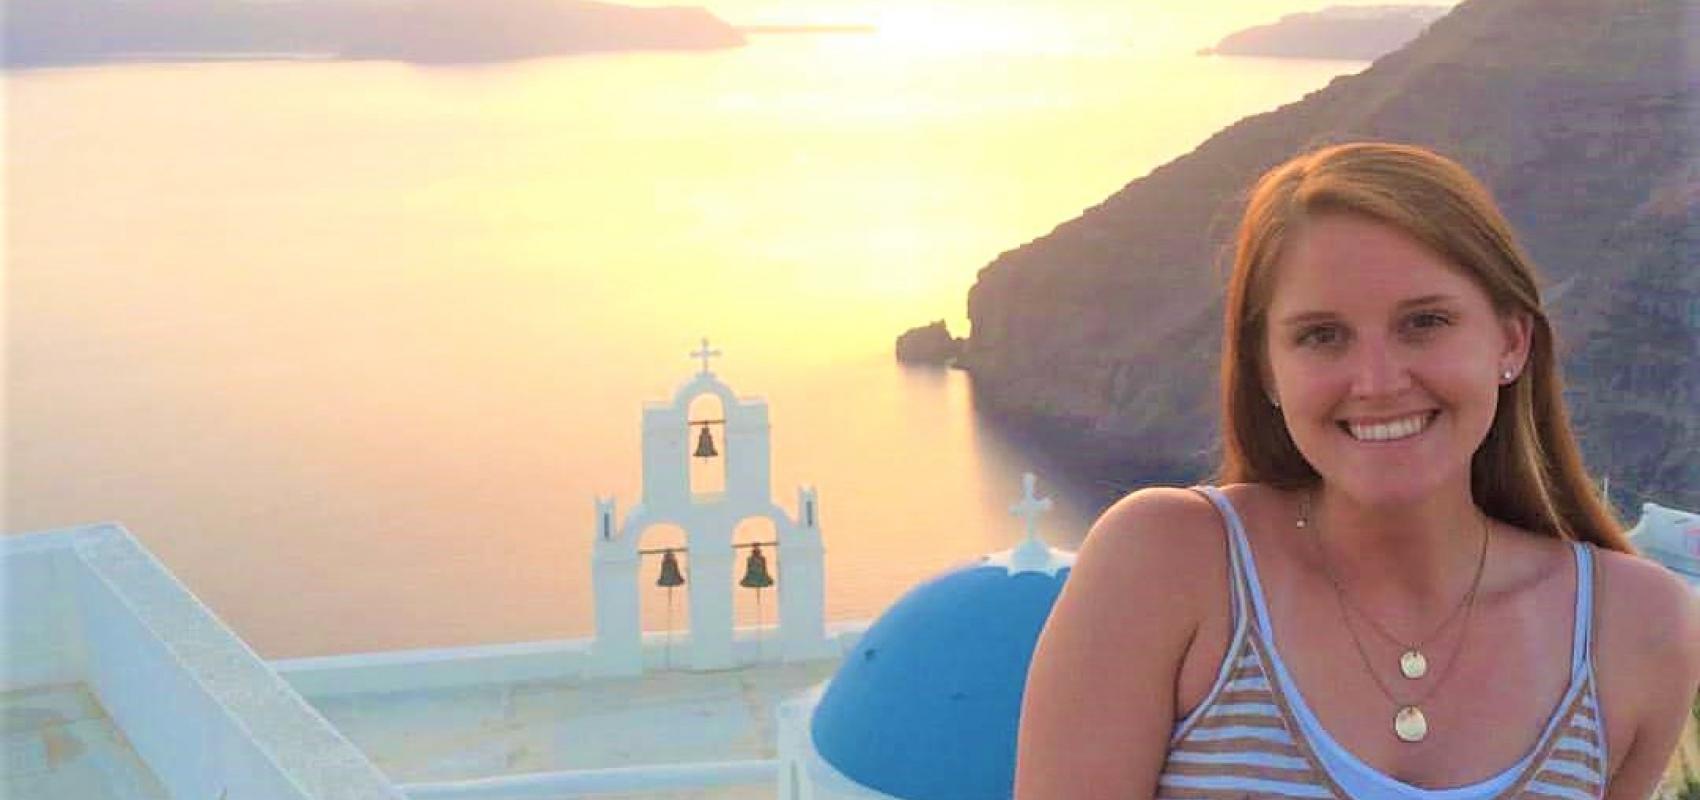 UNI student on island of Santorini at sunset overlooking the sea